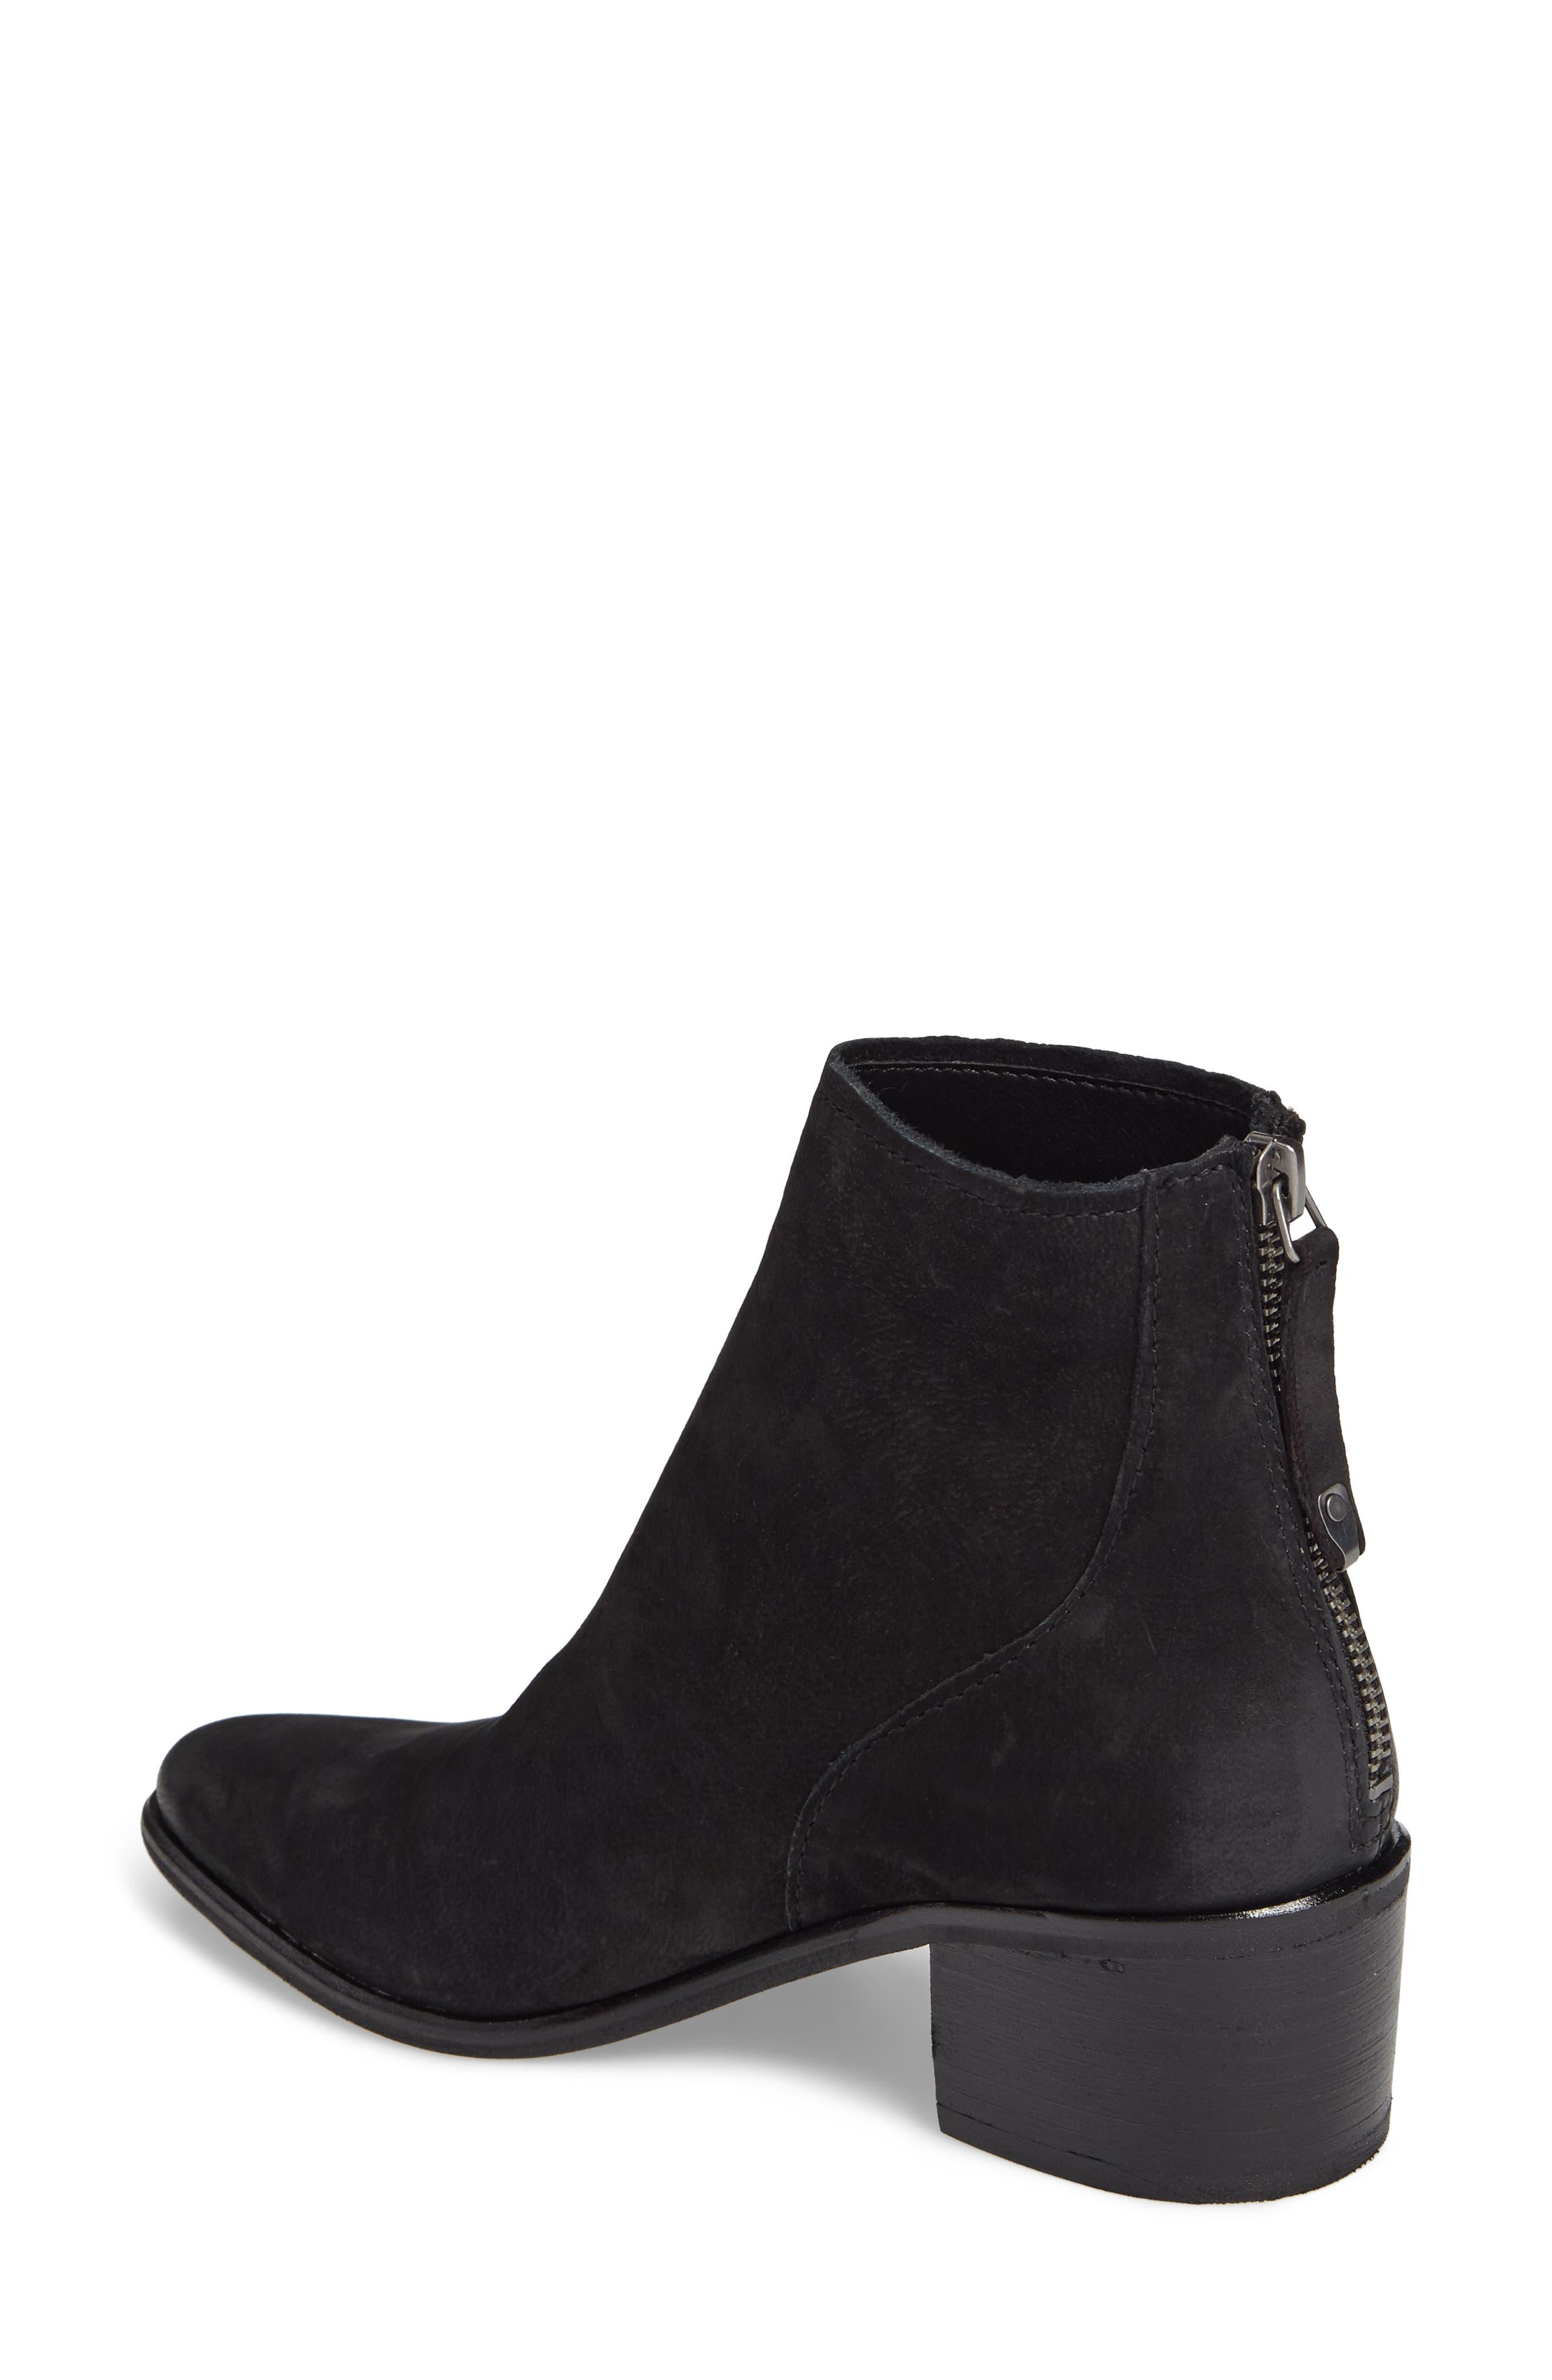 Cassius Block Heel Bootie,                             Alternate thumbnail 2, color,                             Black Nubuck Leather